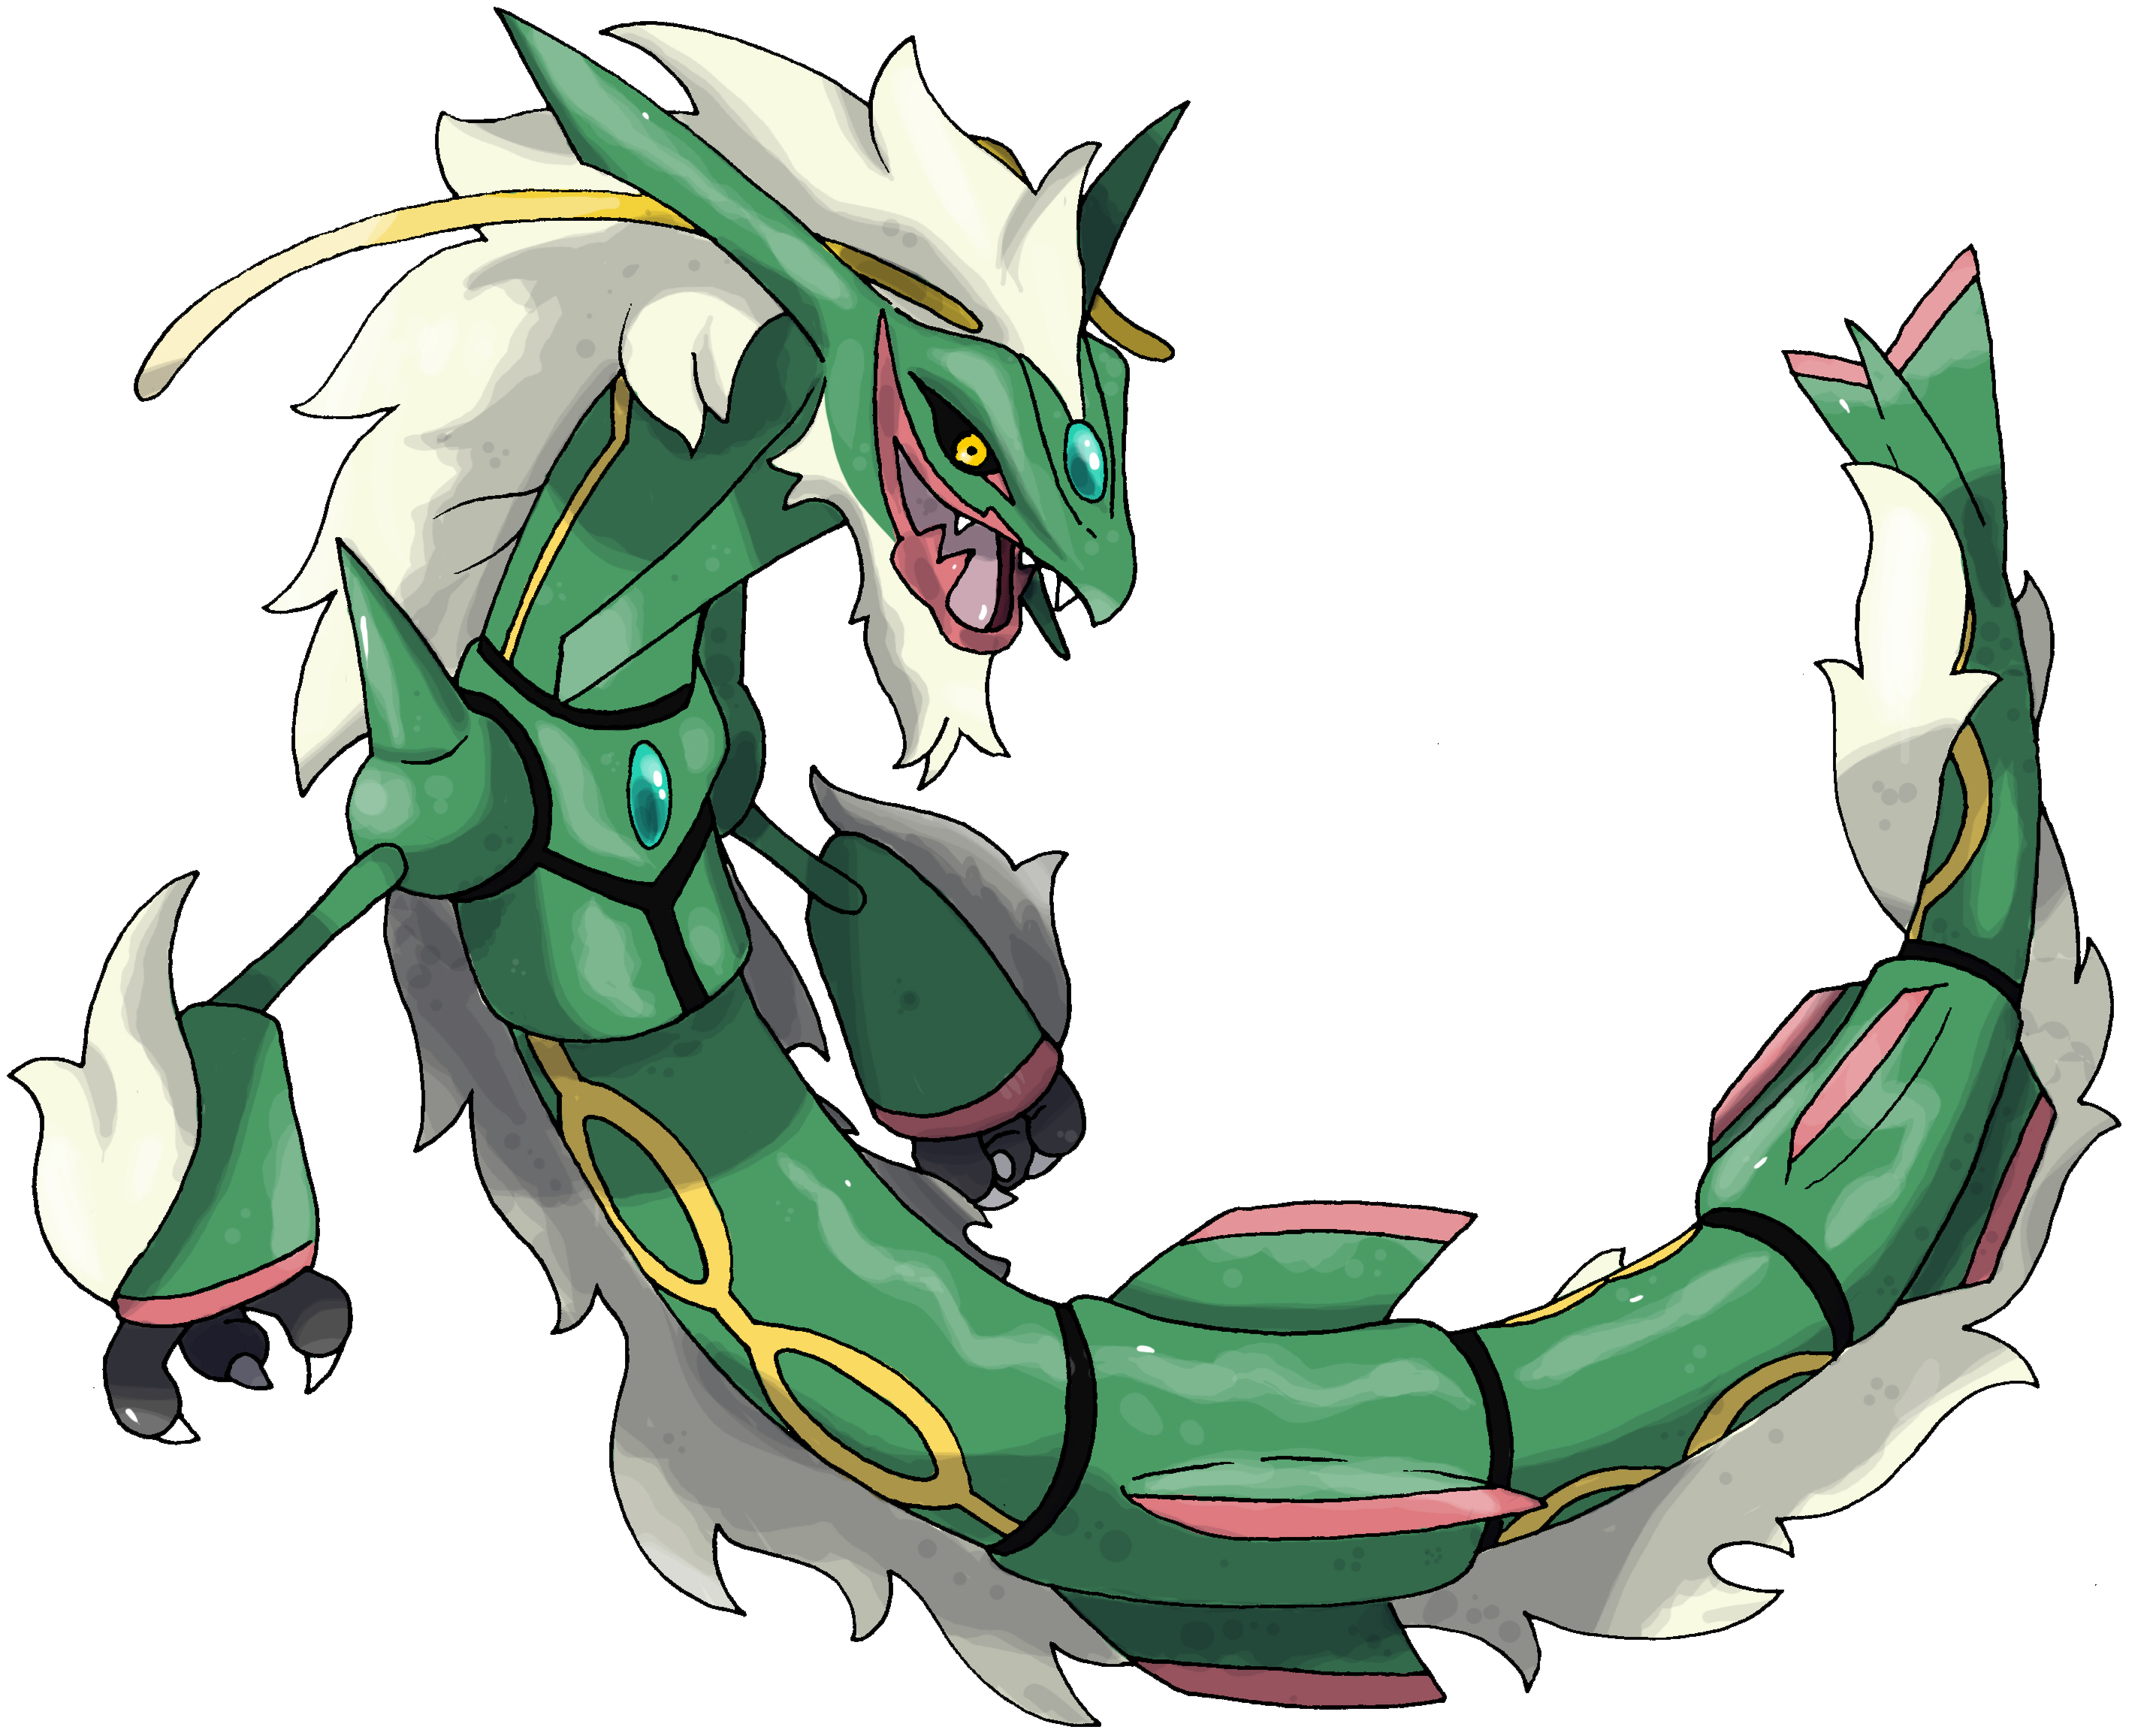 fan made pokemon. pokemon emerald, fan, minions trailer, nintendo, robots, tower, spas, dragons, mega evolution fan made